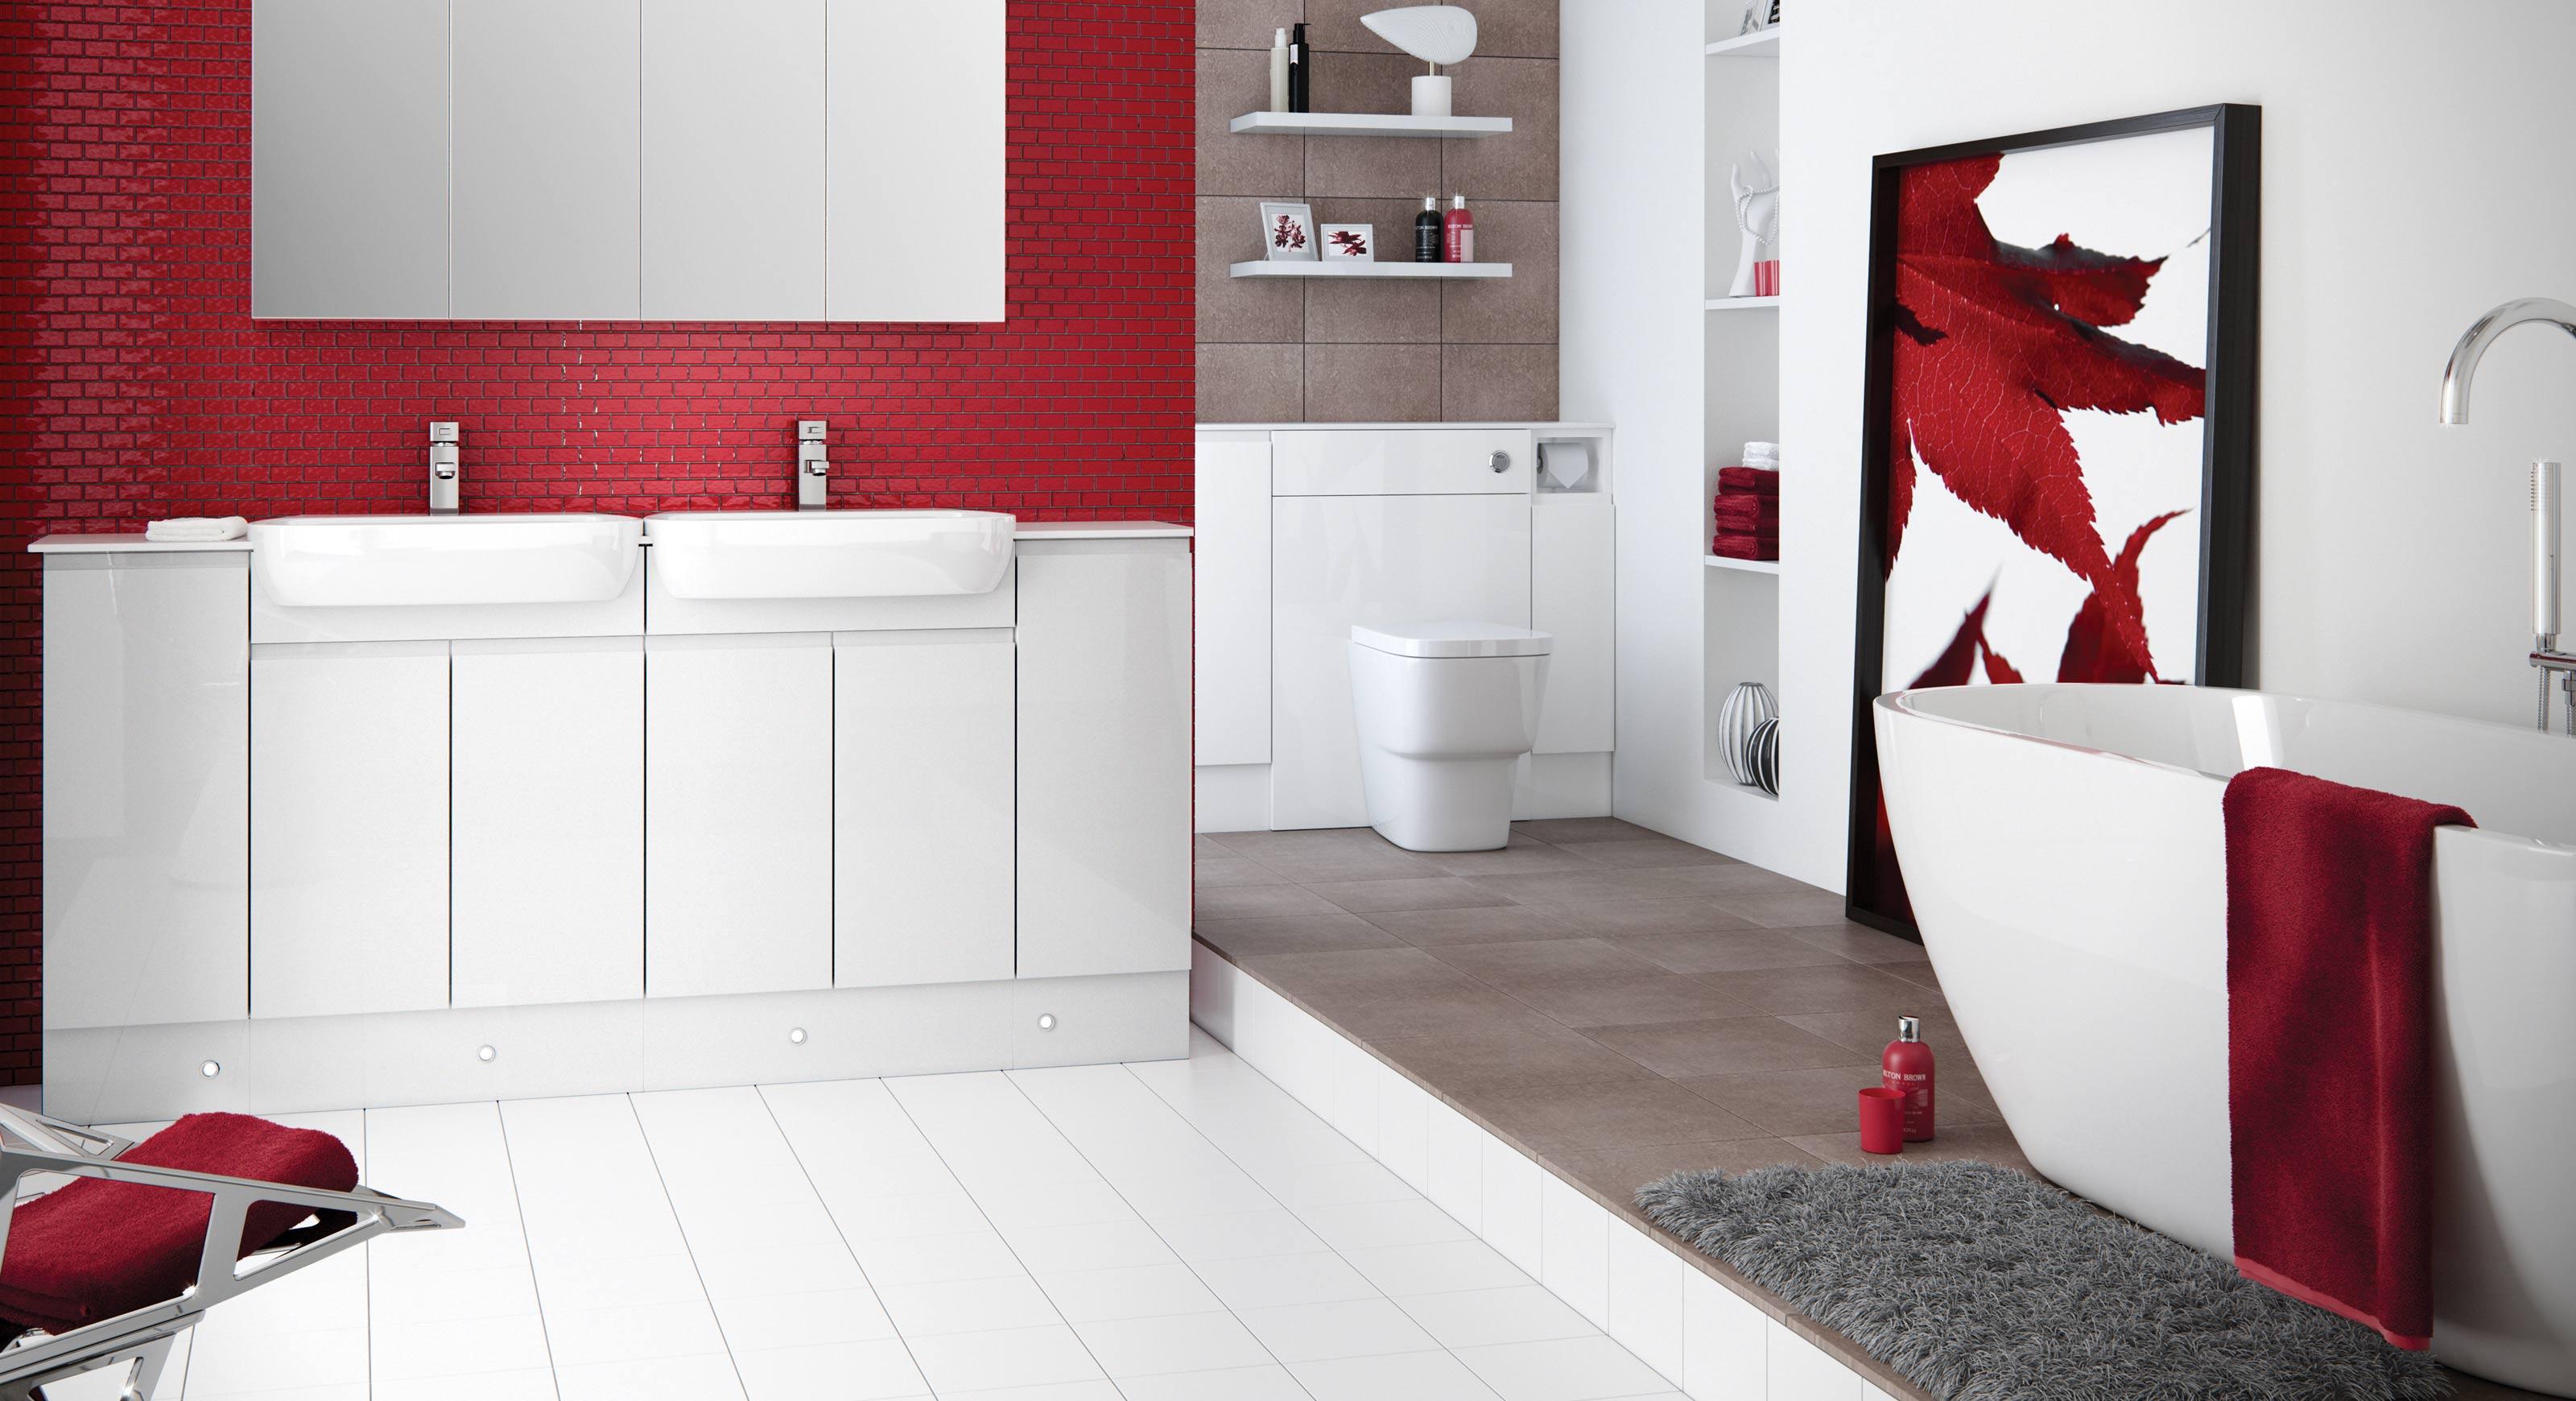 Bathrooms To Love Fresco Contemporary regarding measurements 3200 X 1740